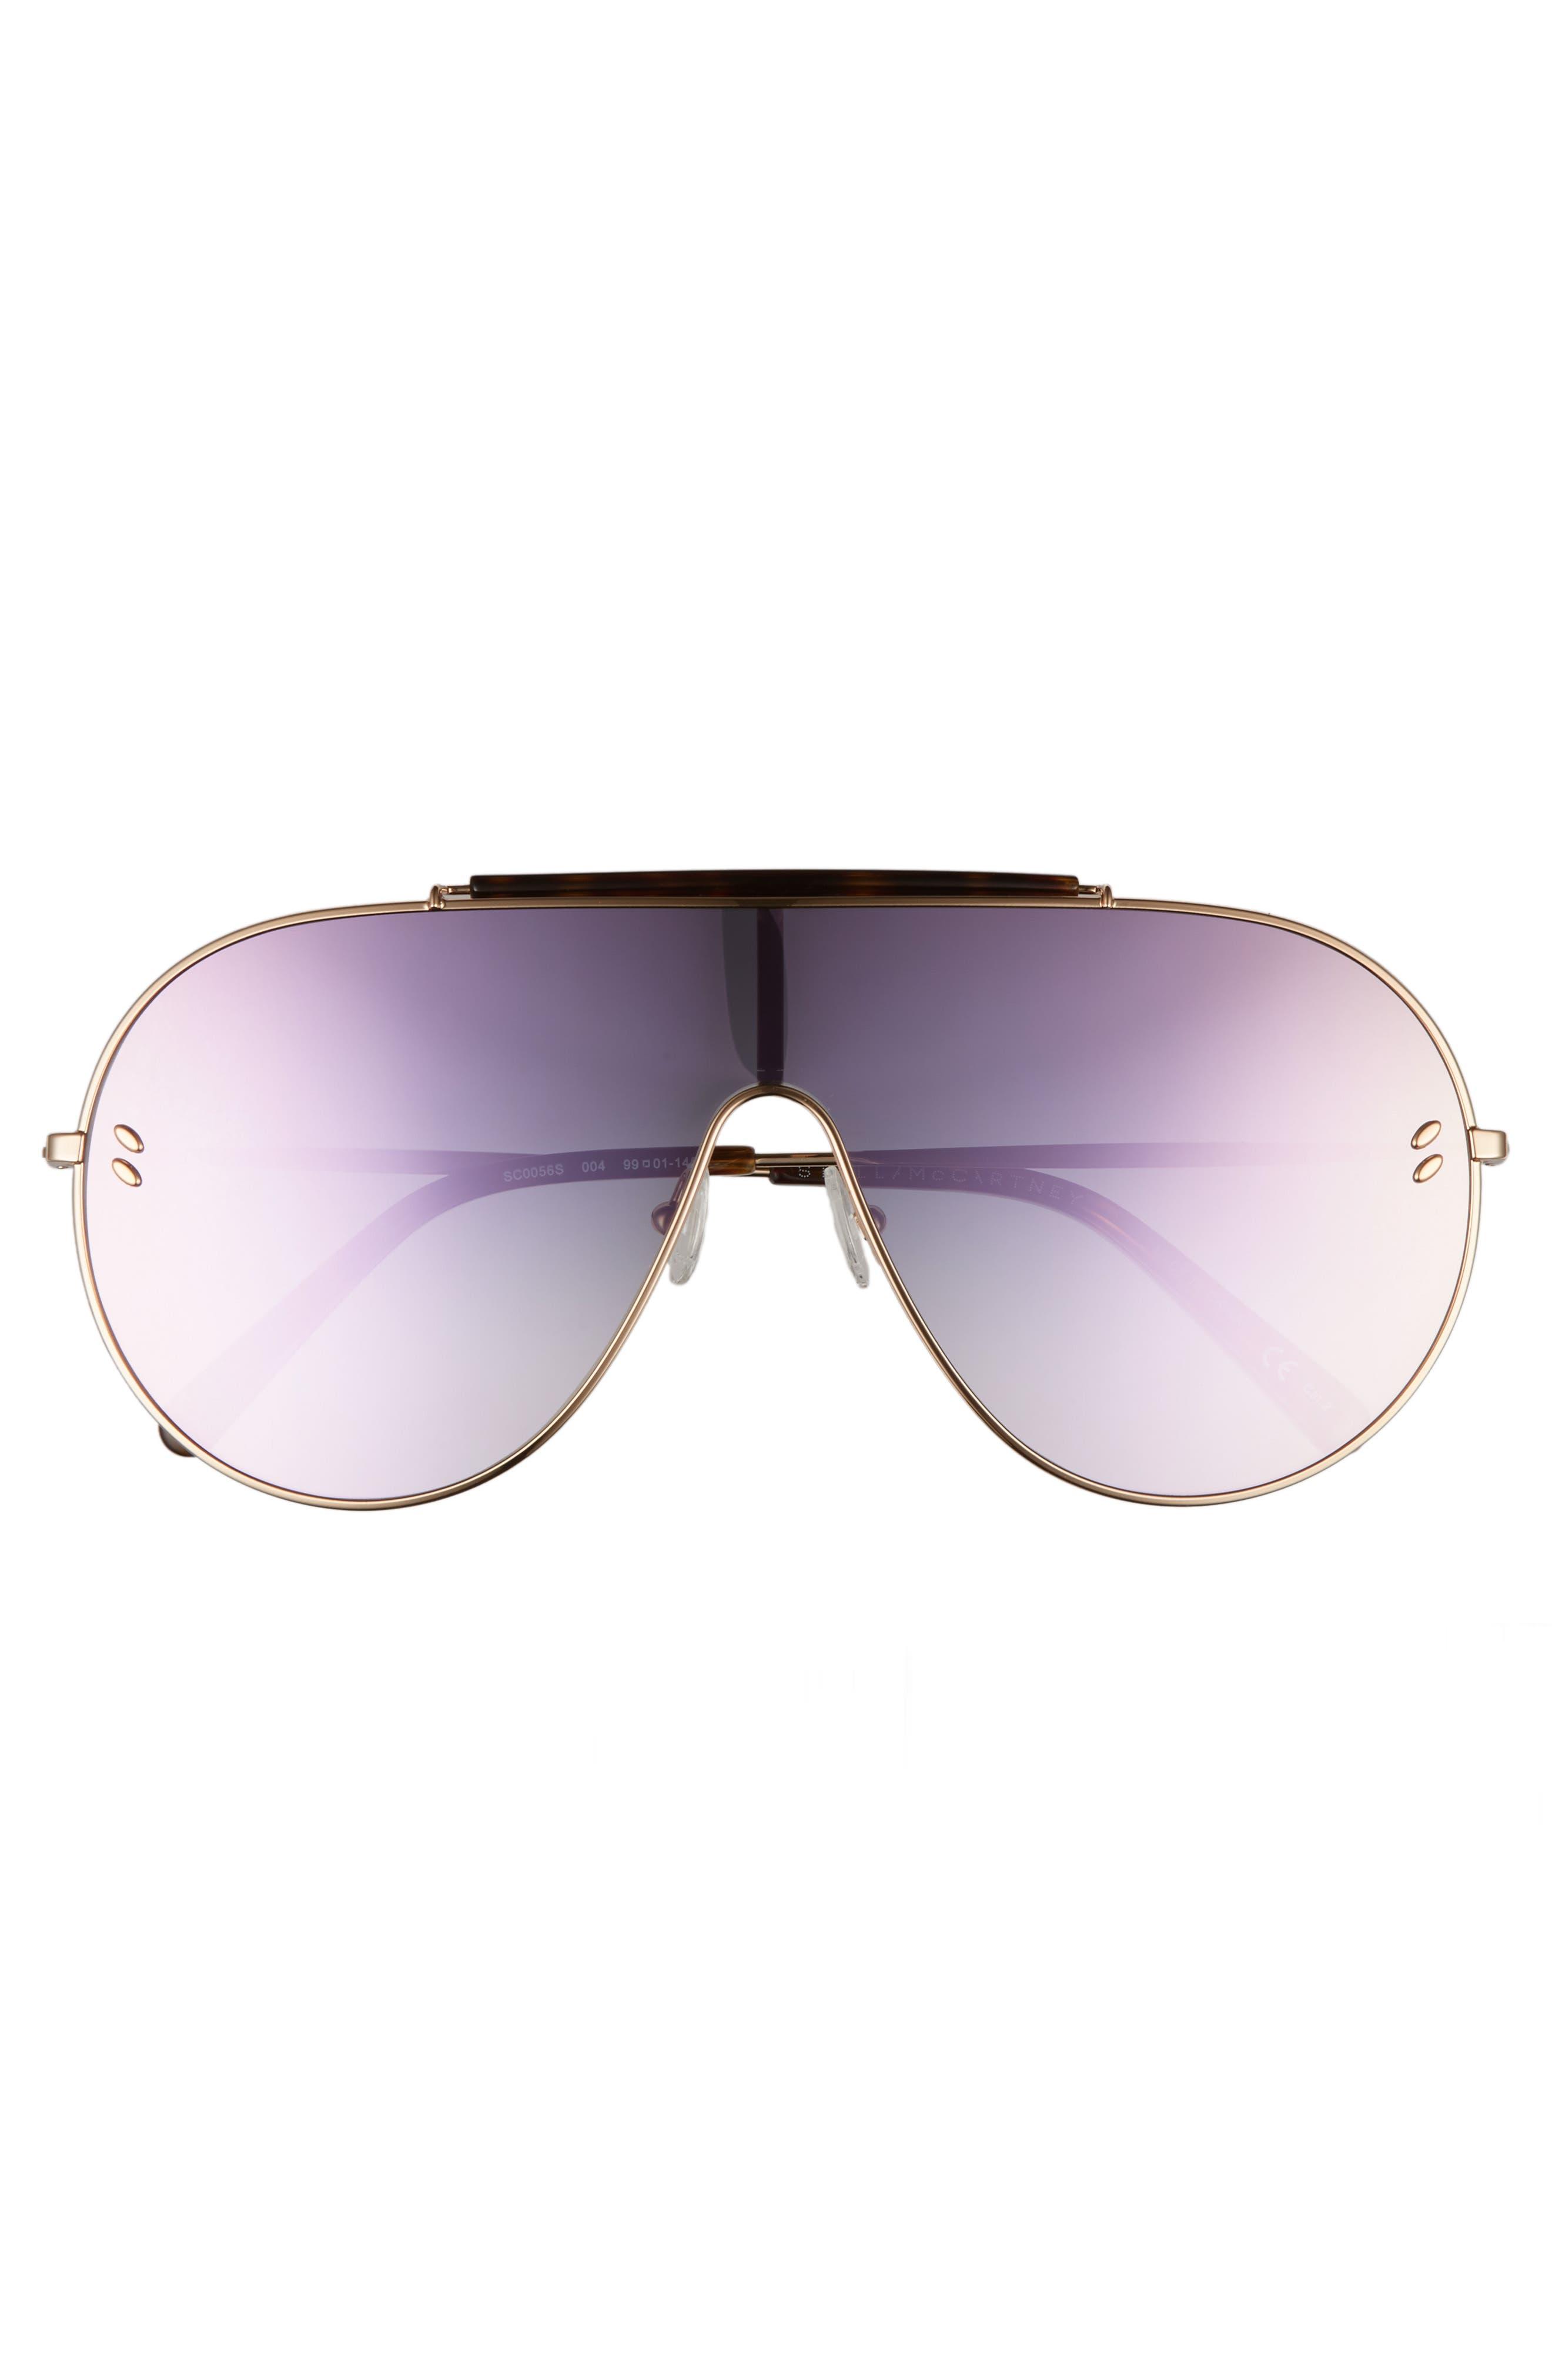 65mm Shield Sunglasses,                             Alternate thumbnail 6, color,